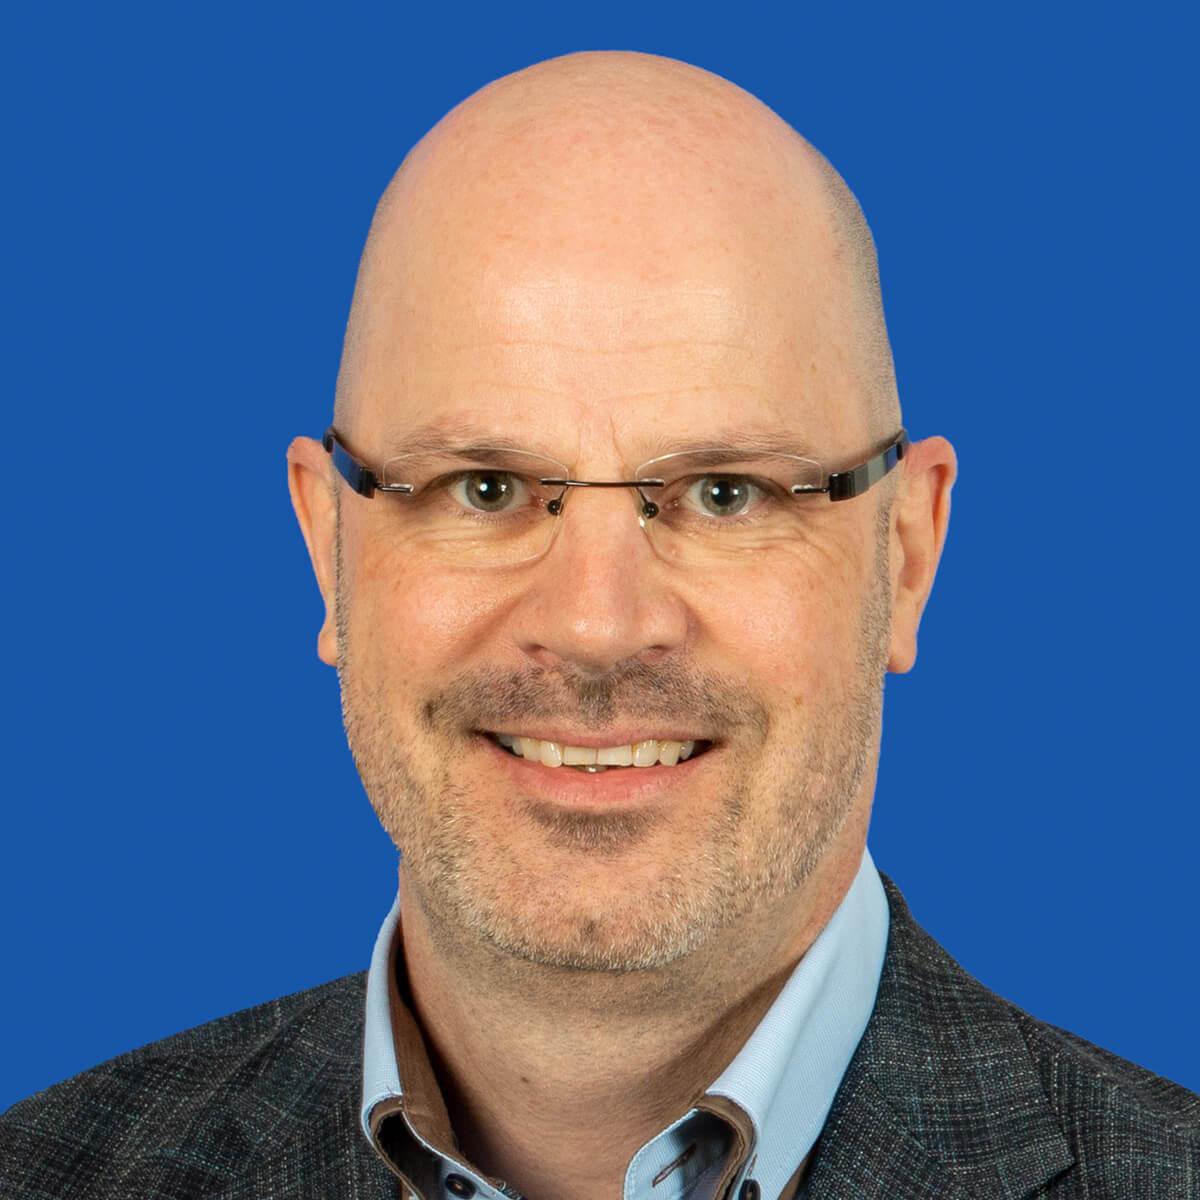 Christoph Schuhr